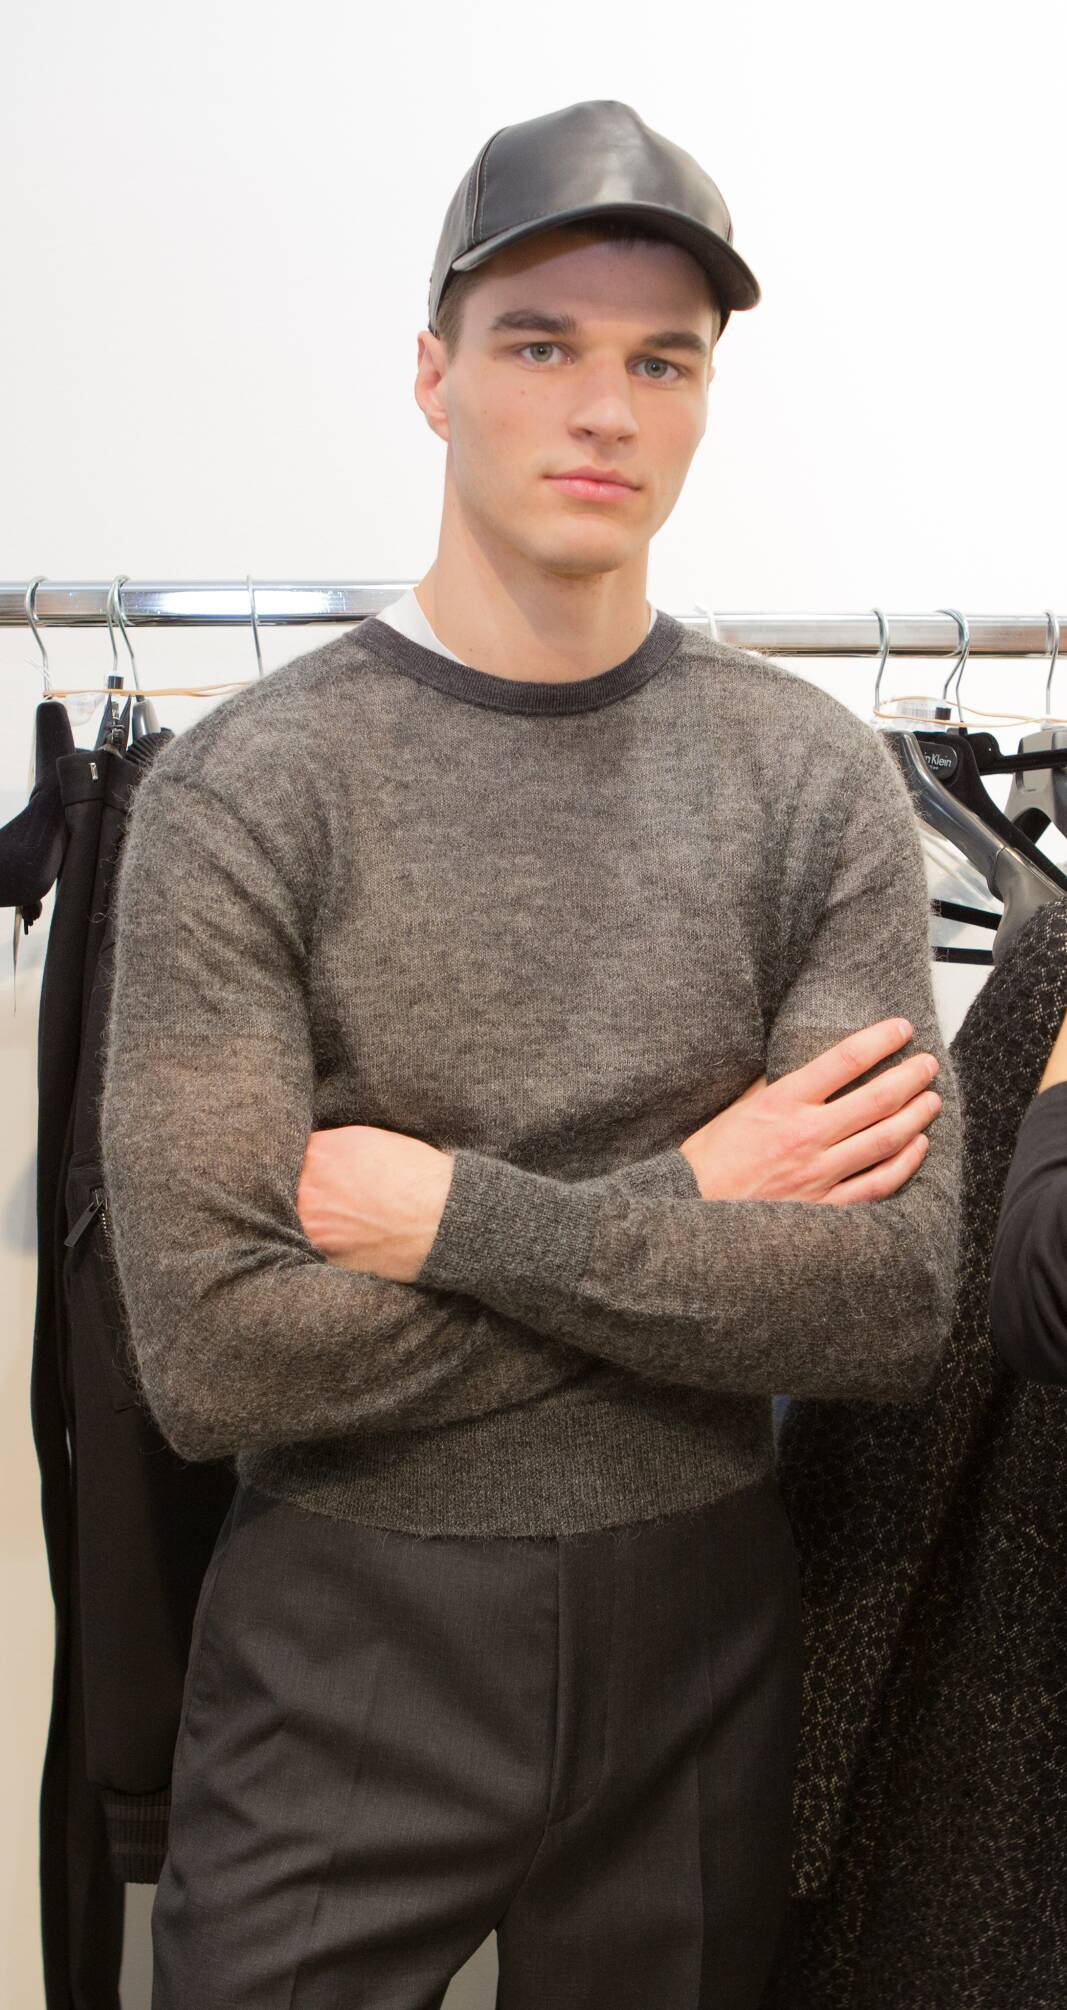 Backstage Calvin Klein Collection Man Model